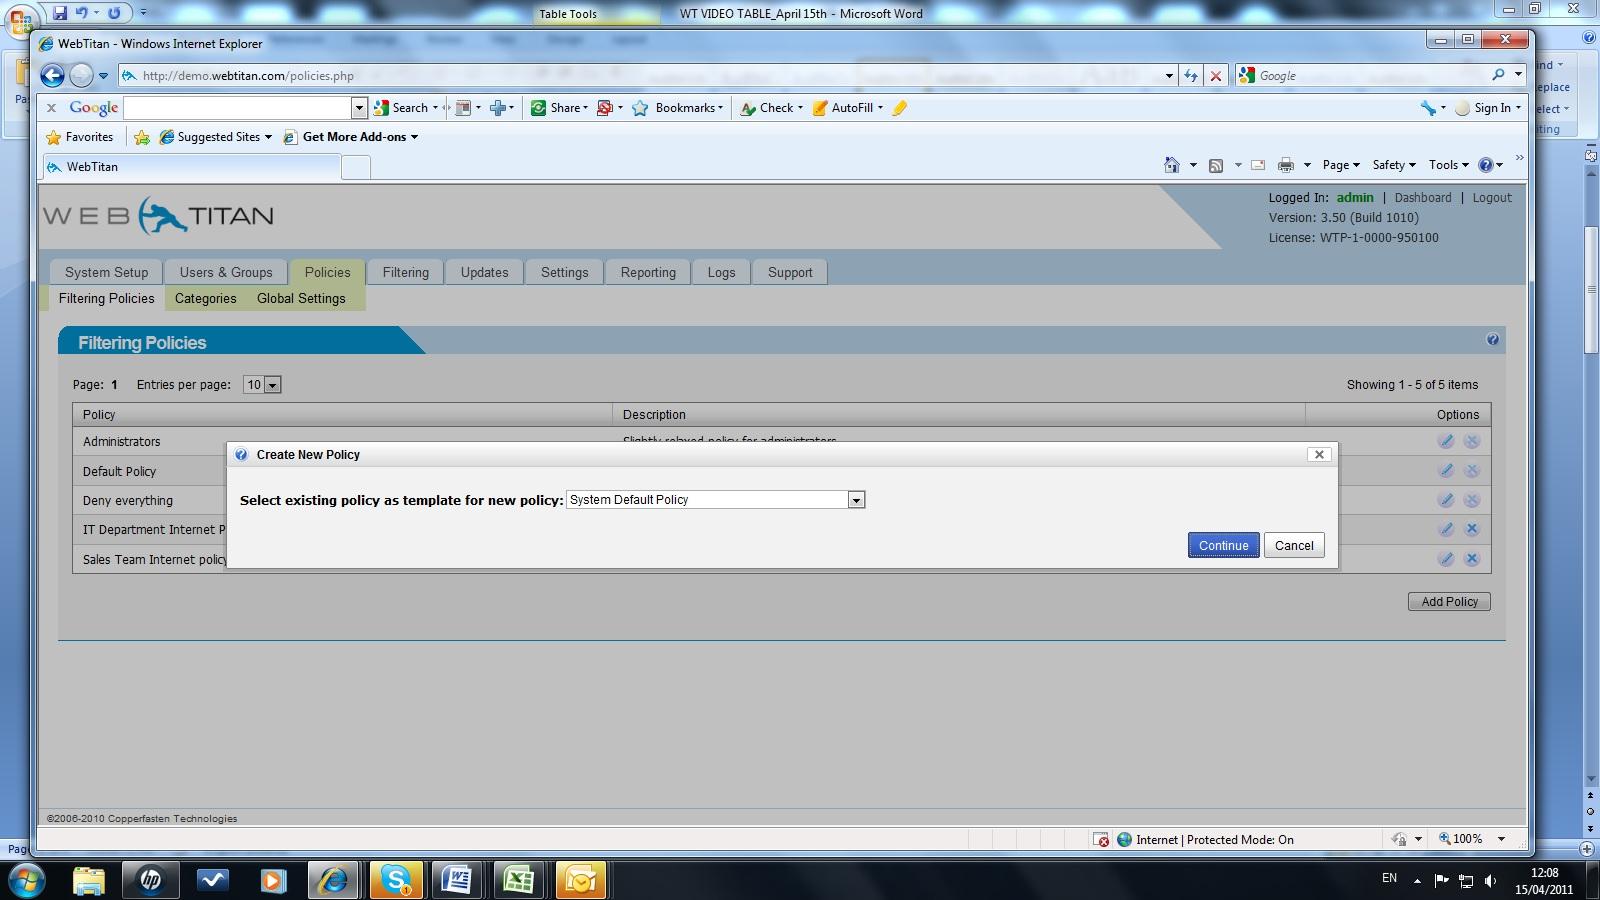 TitanHQ WebTitan Cloud Demo - ADD+POLICY+SCREEN.jpg